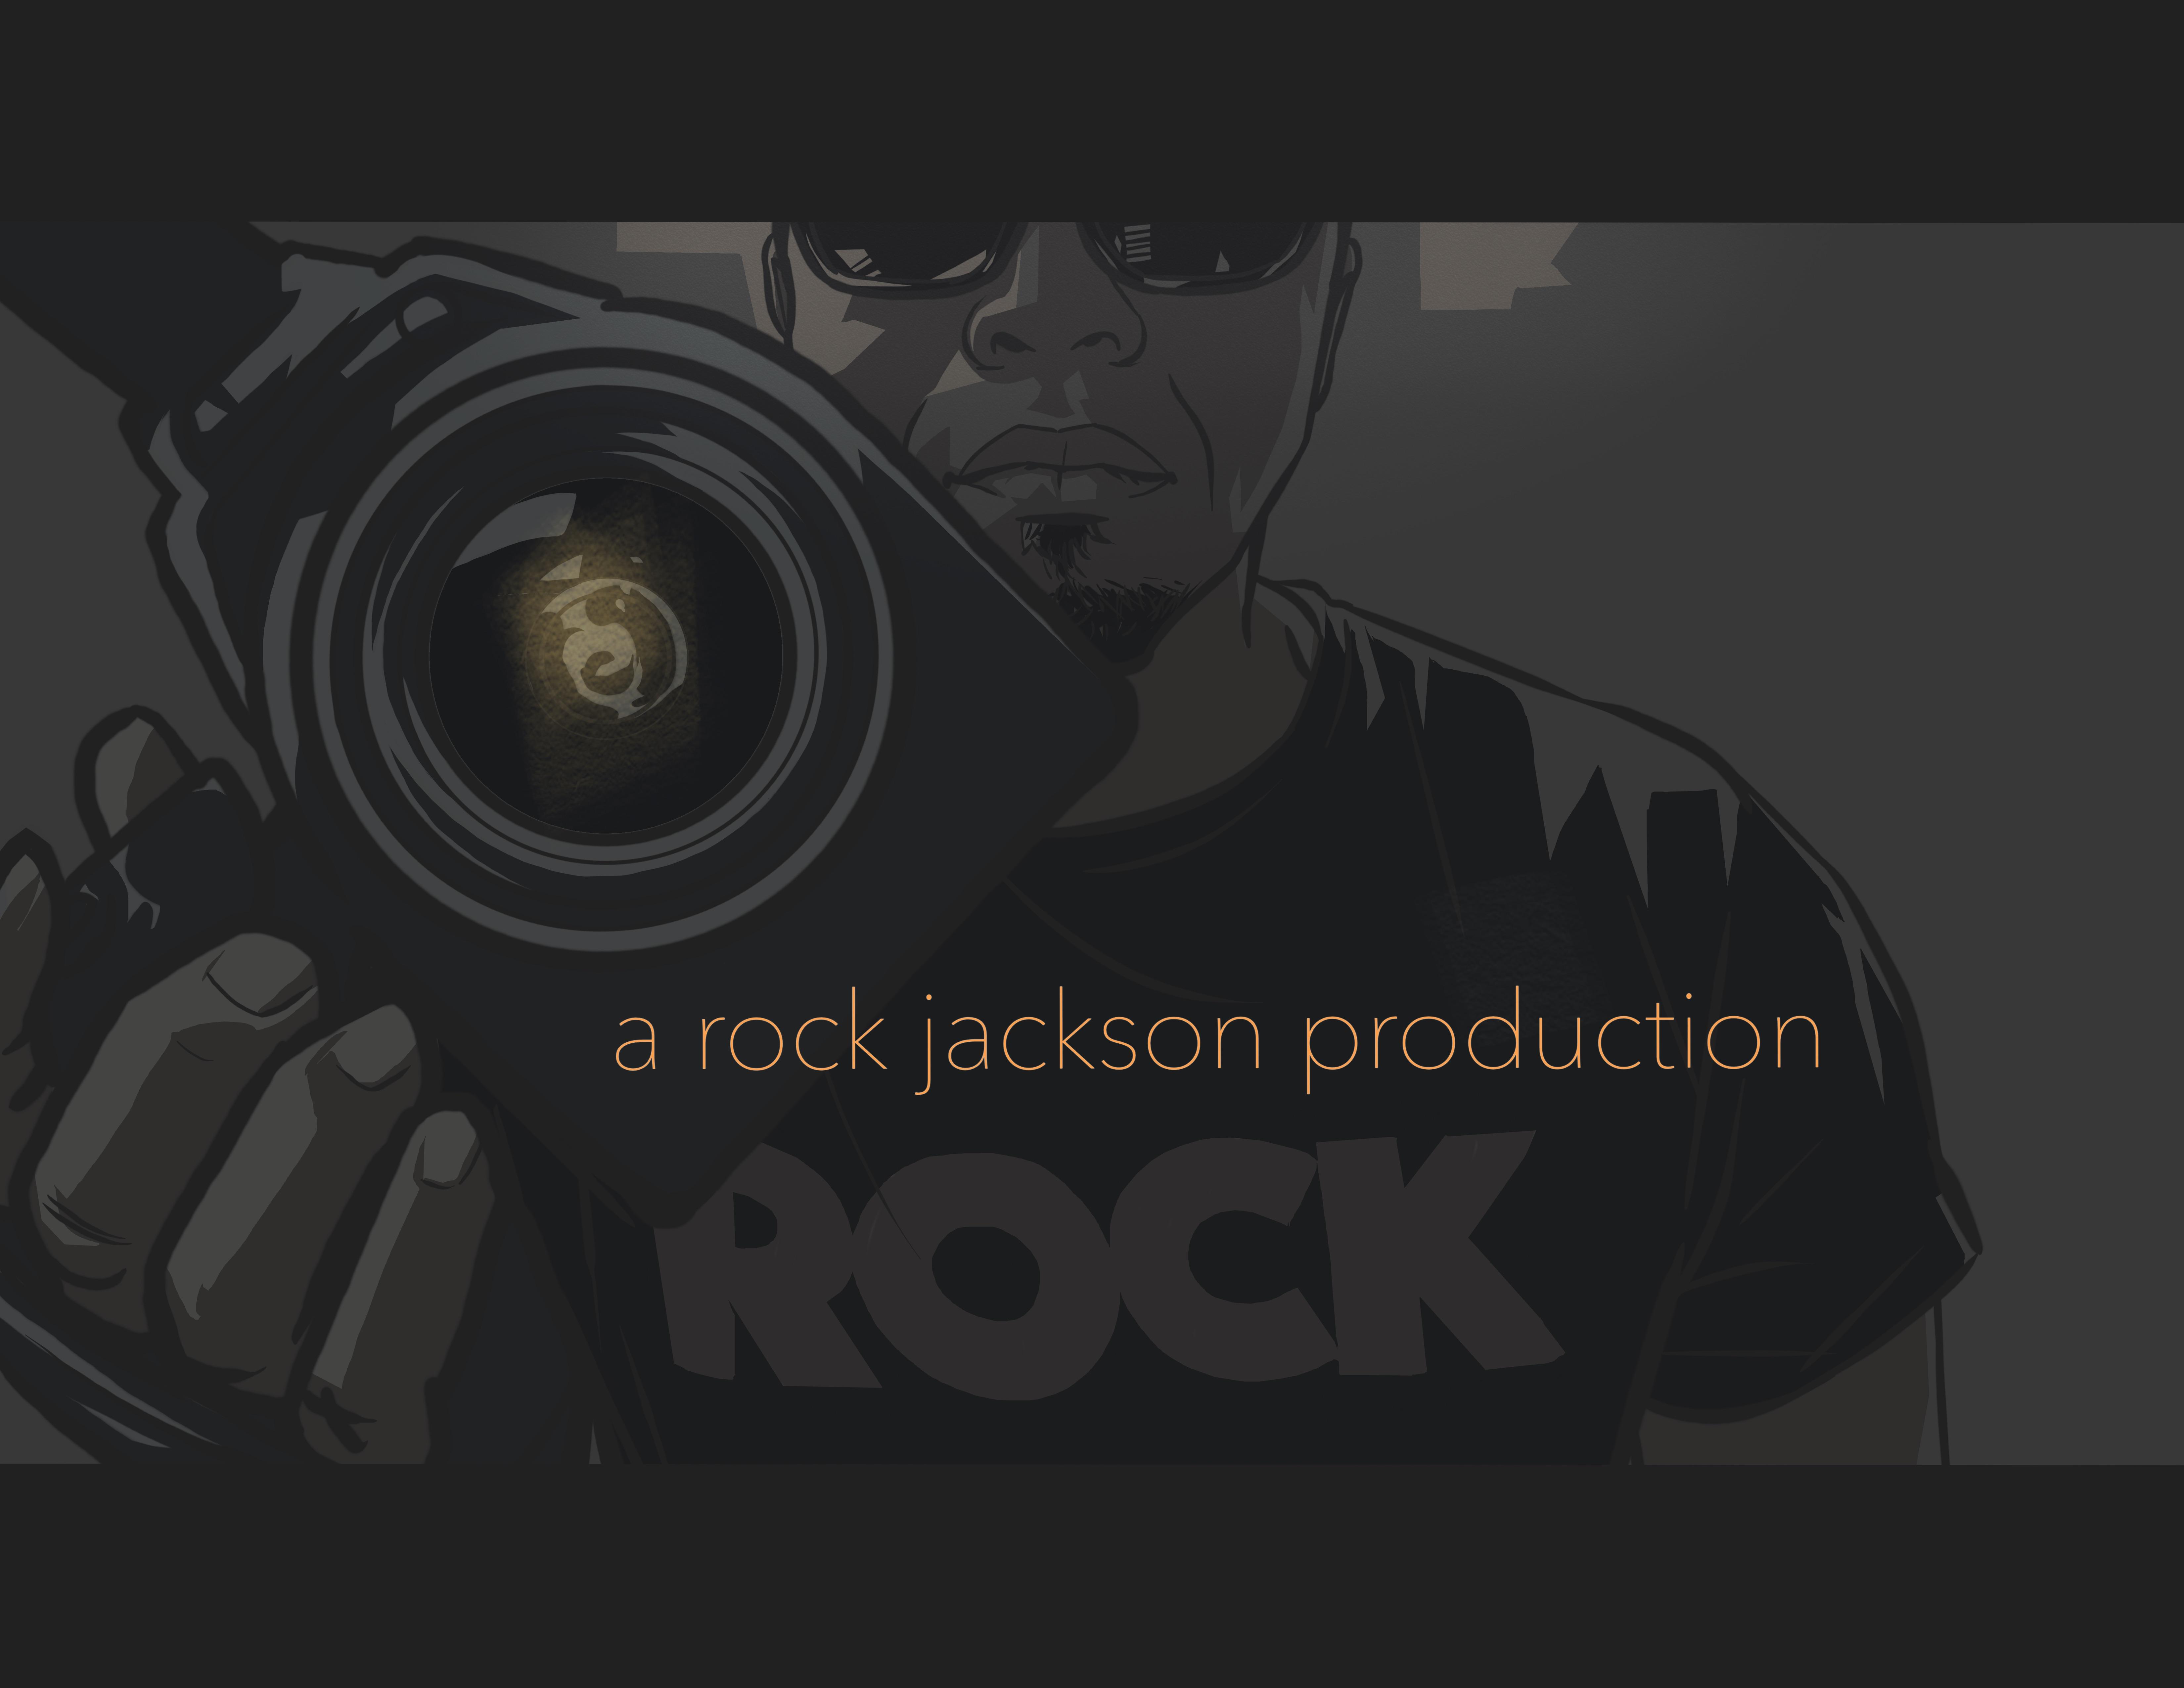 Rock Jackson animation production title